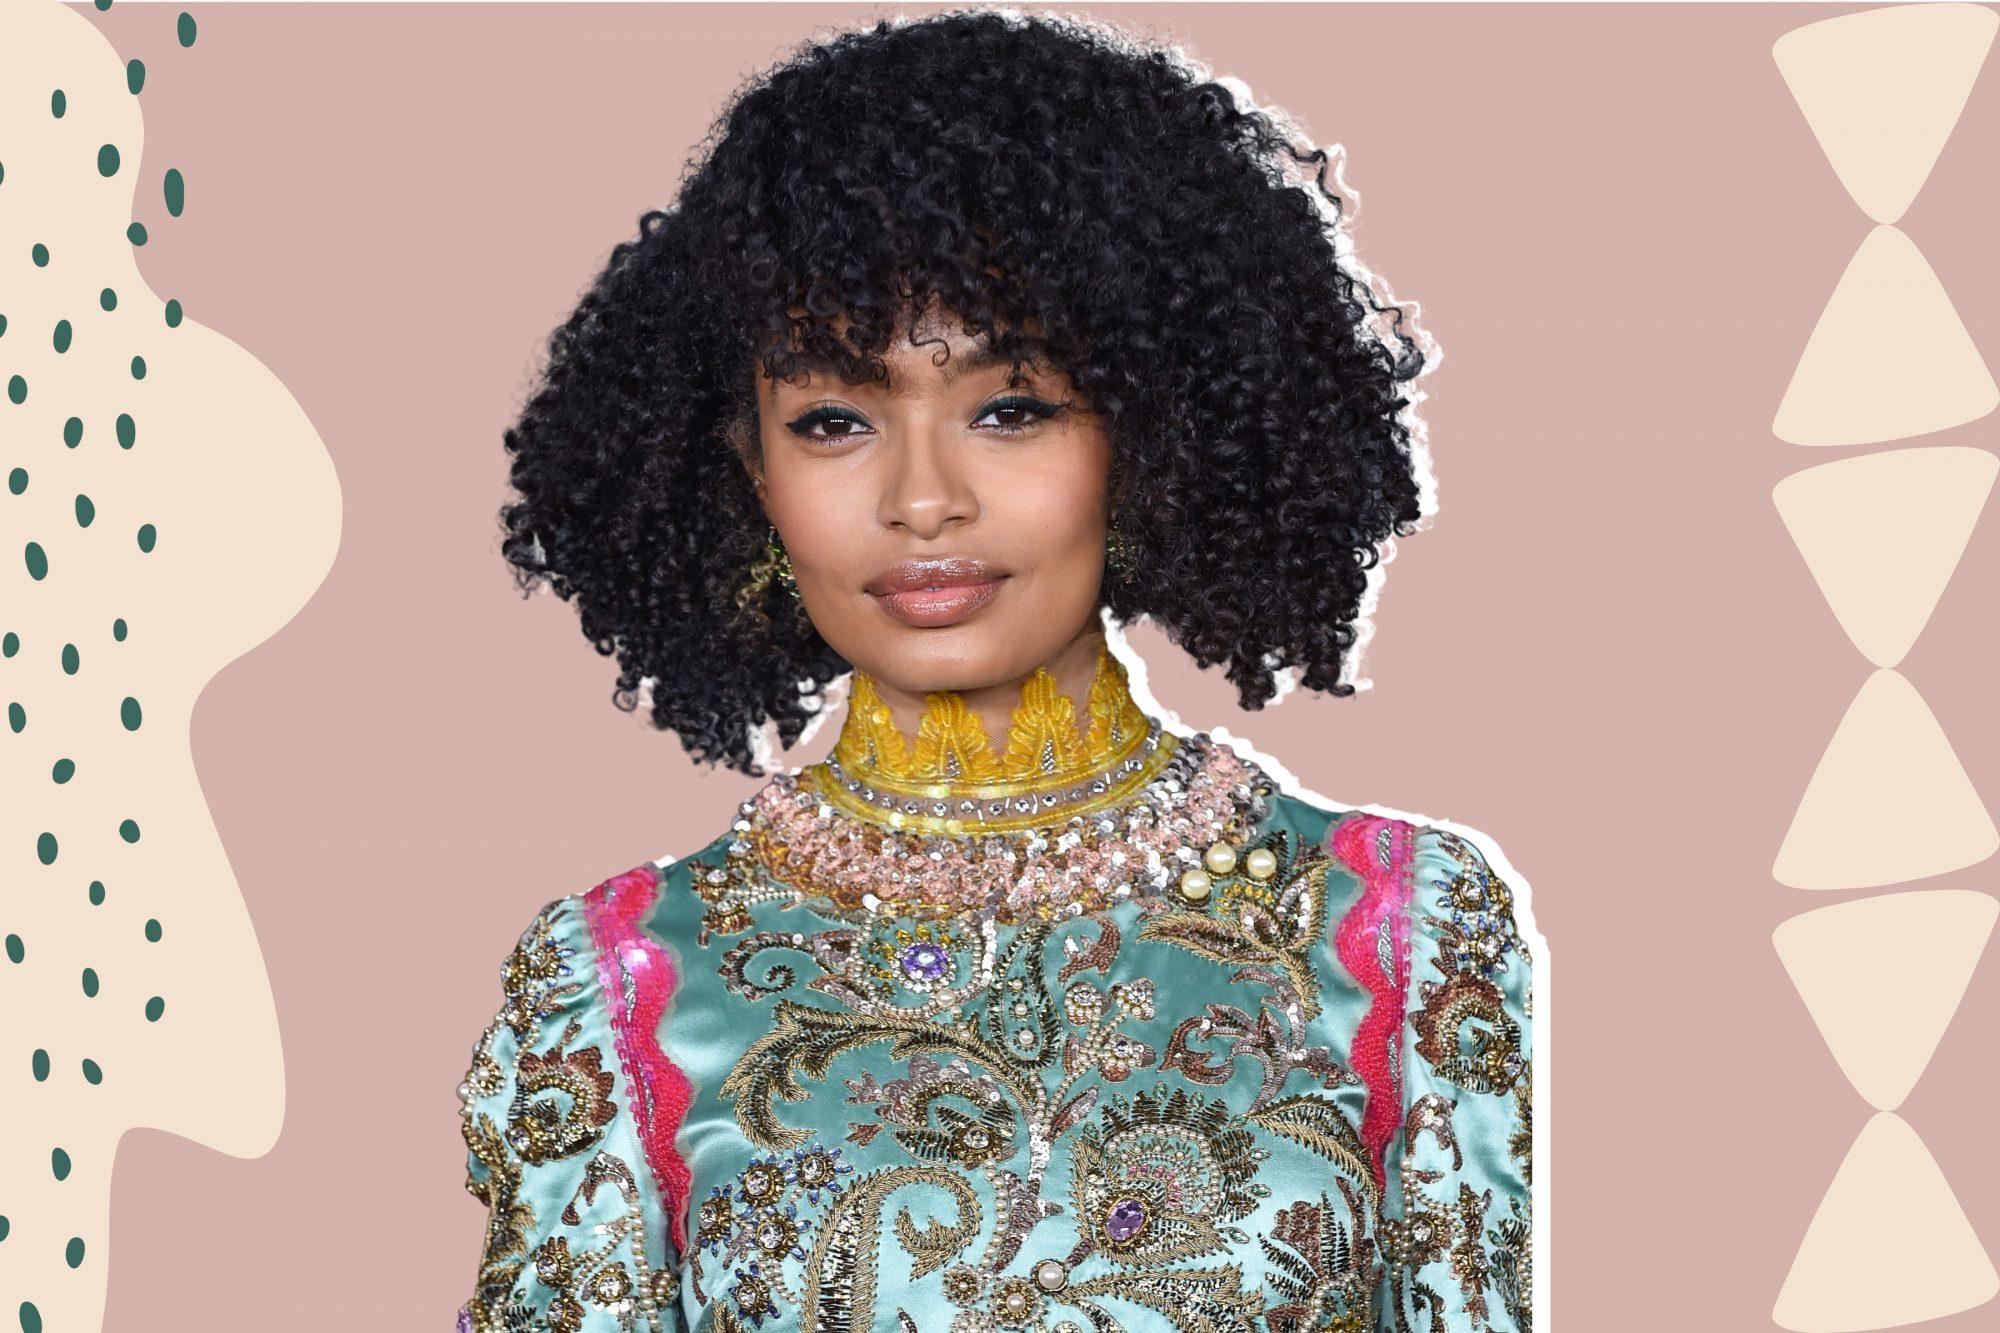 yara shahidi hairstylist christine brown tips